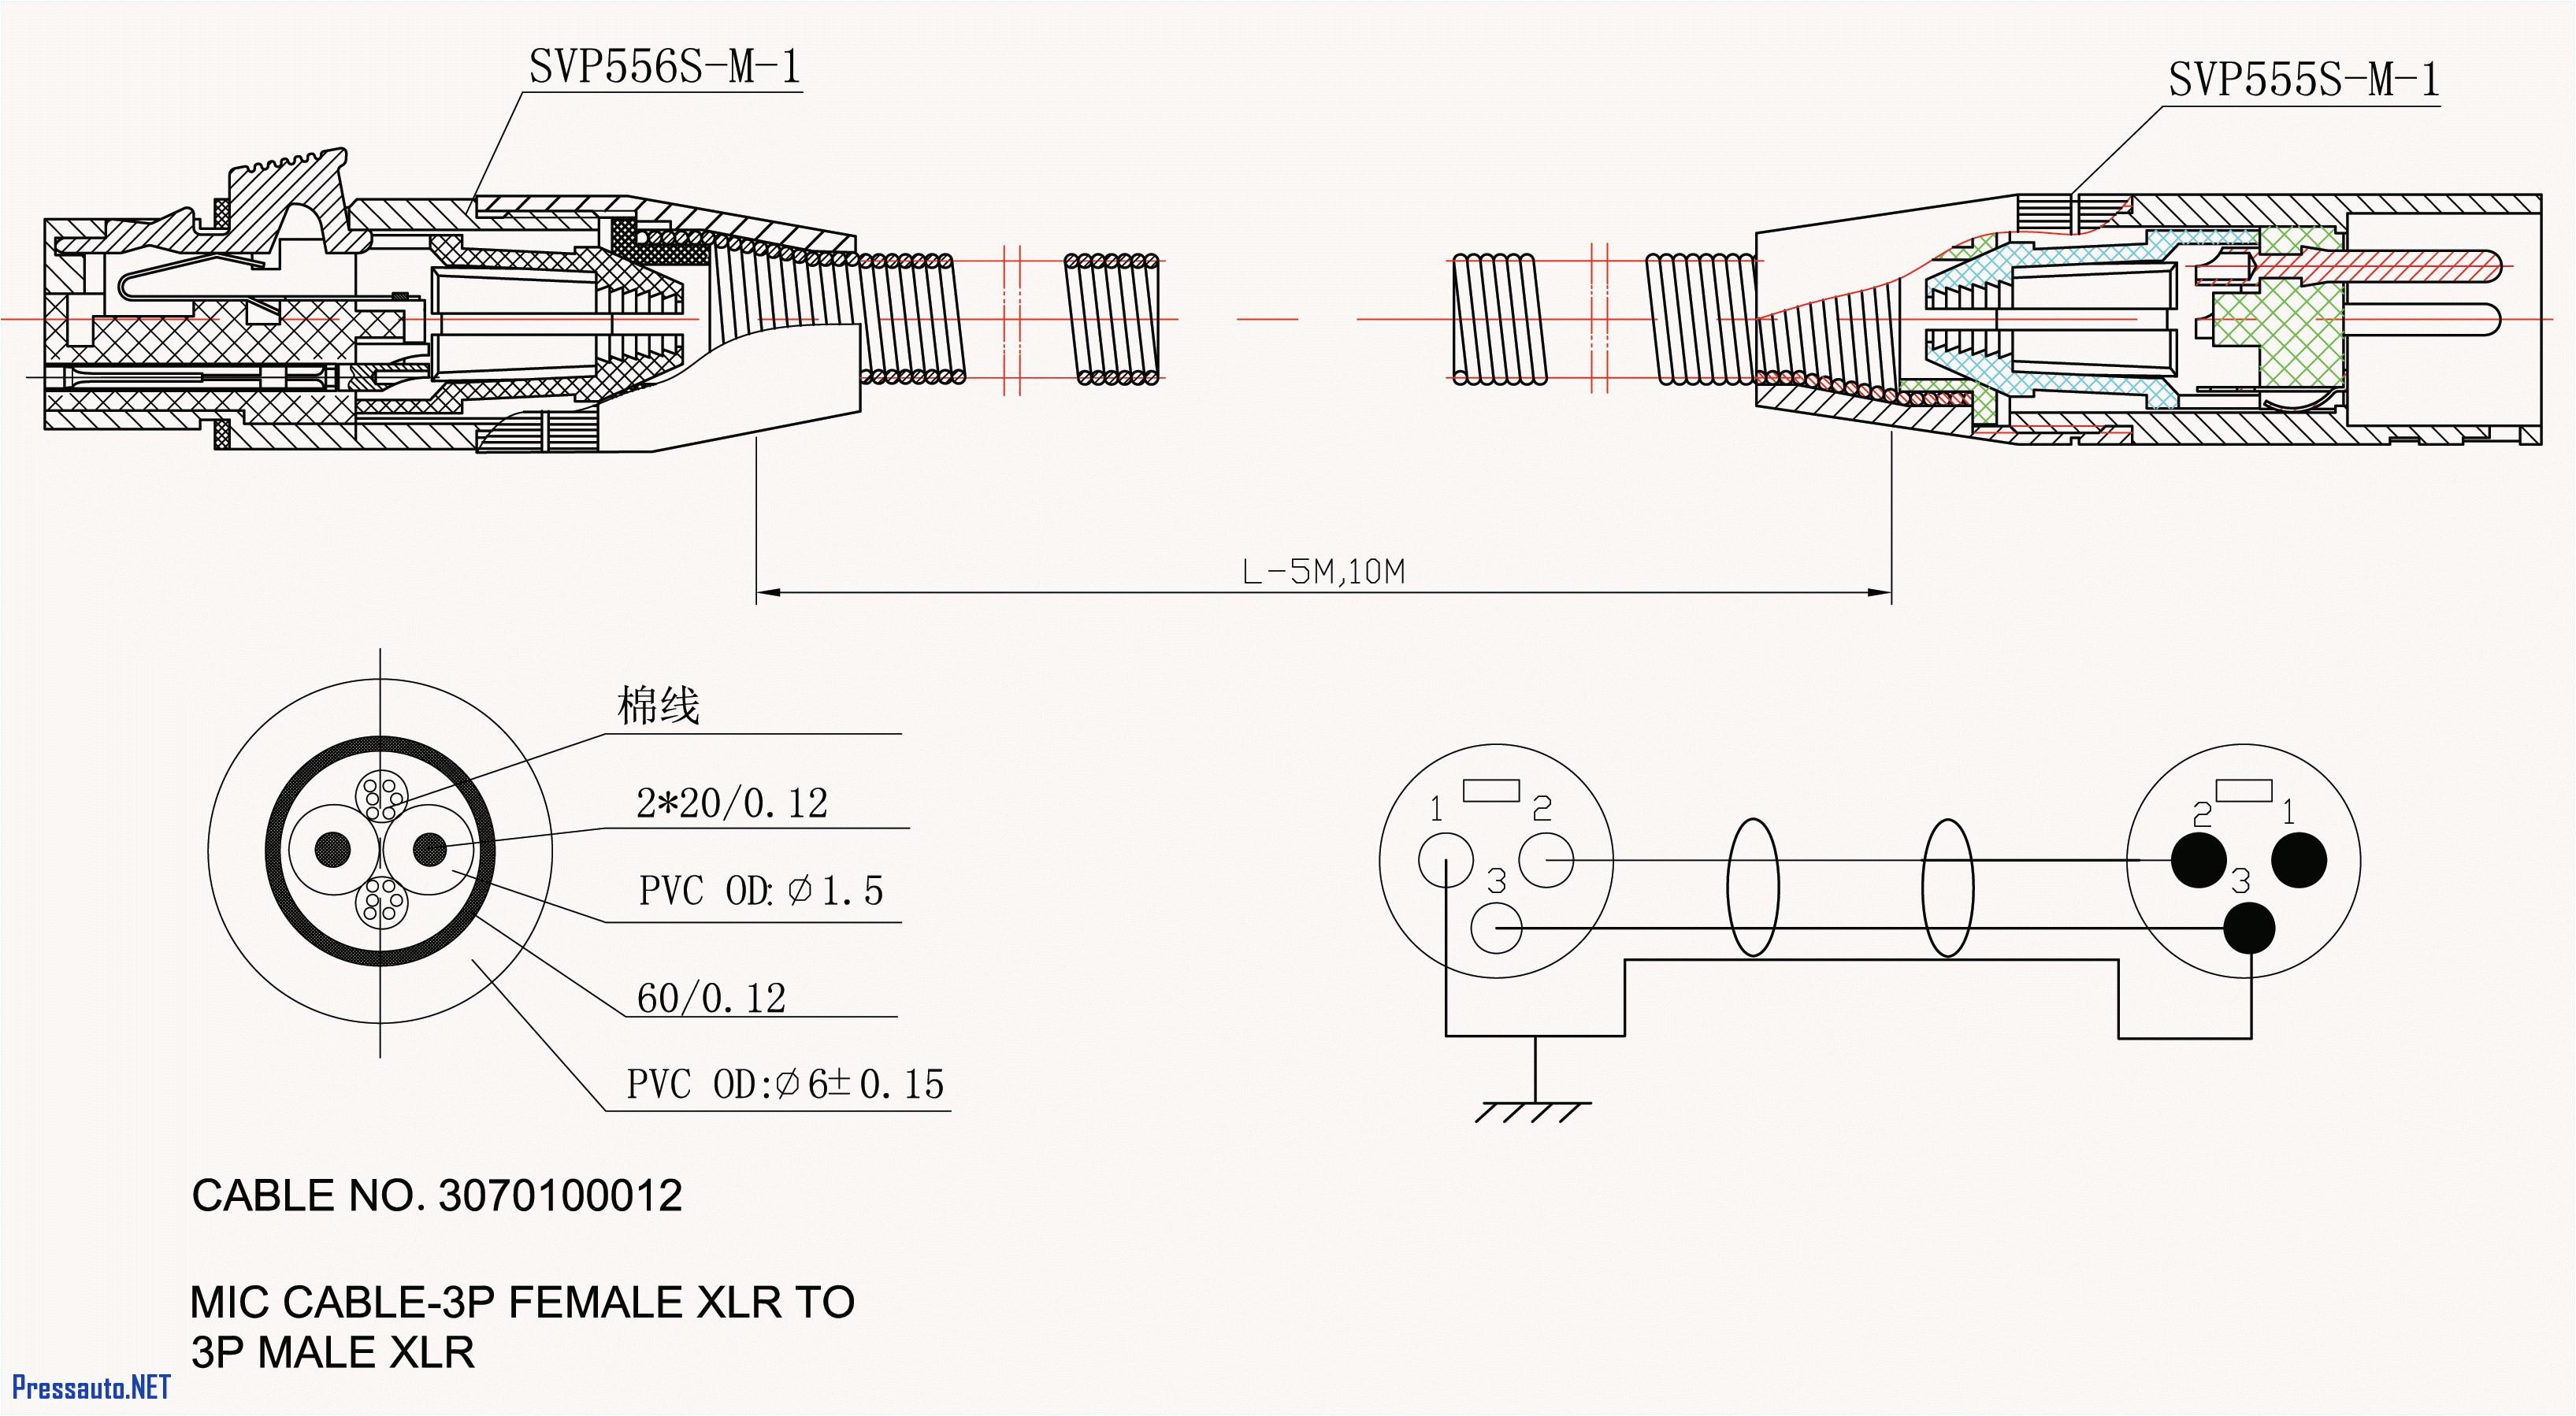 20 hyundai tiburon radio wiring diagram and gmc envoy radio wiring of 20 hyundai tiburon radio wiring diagram jpg